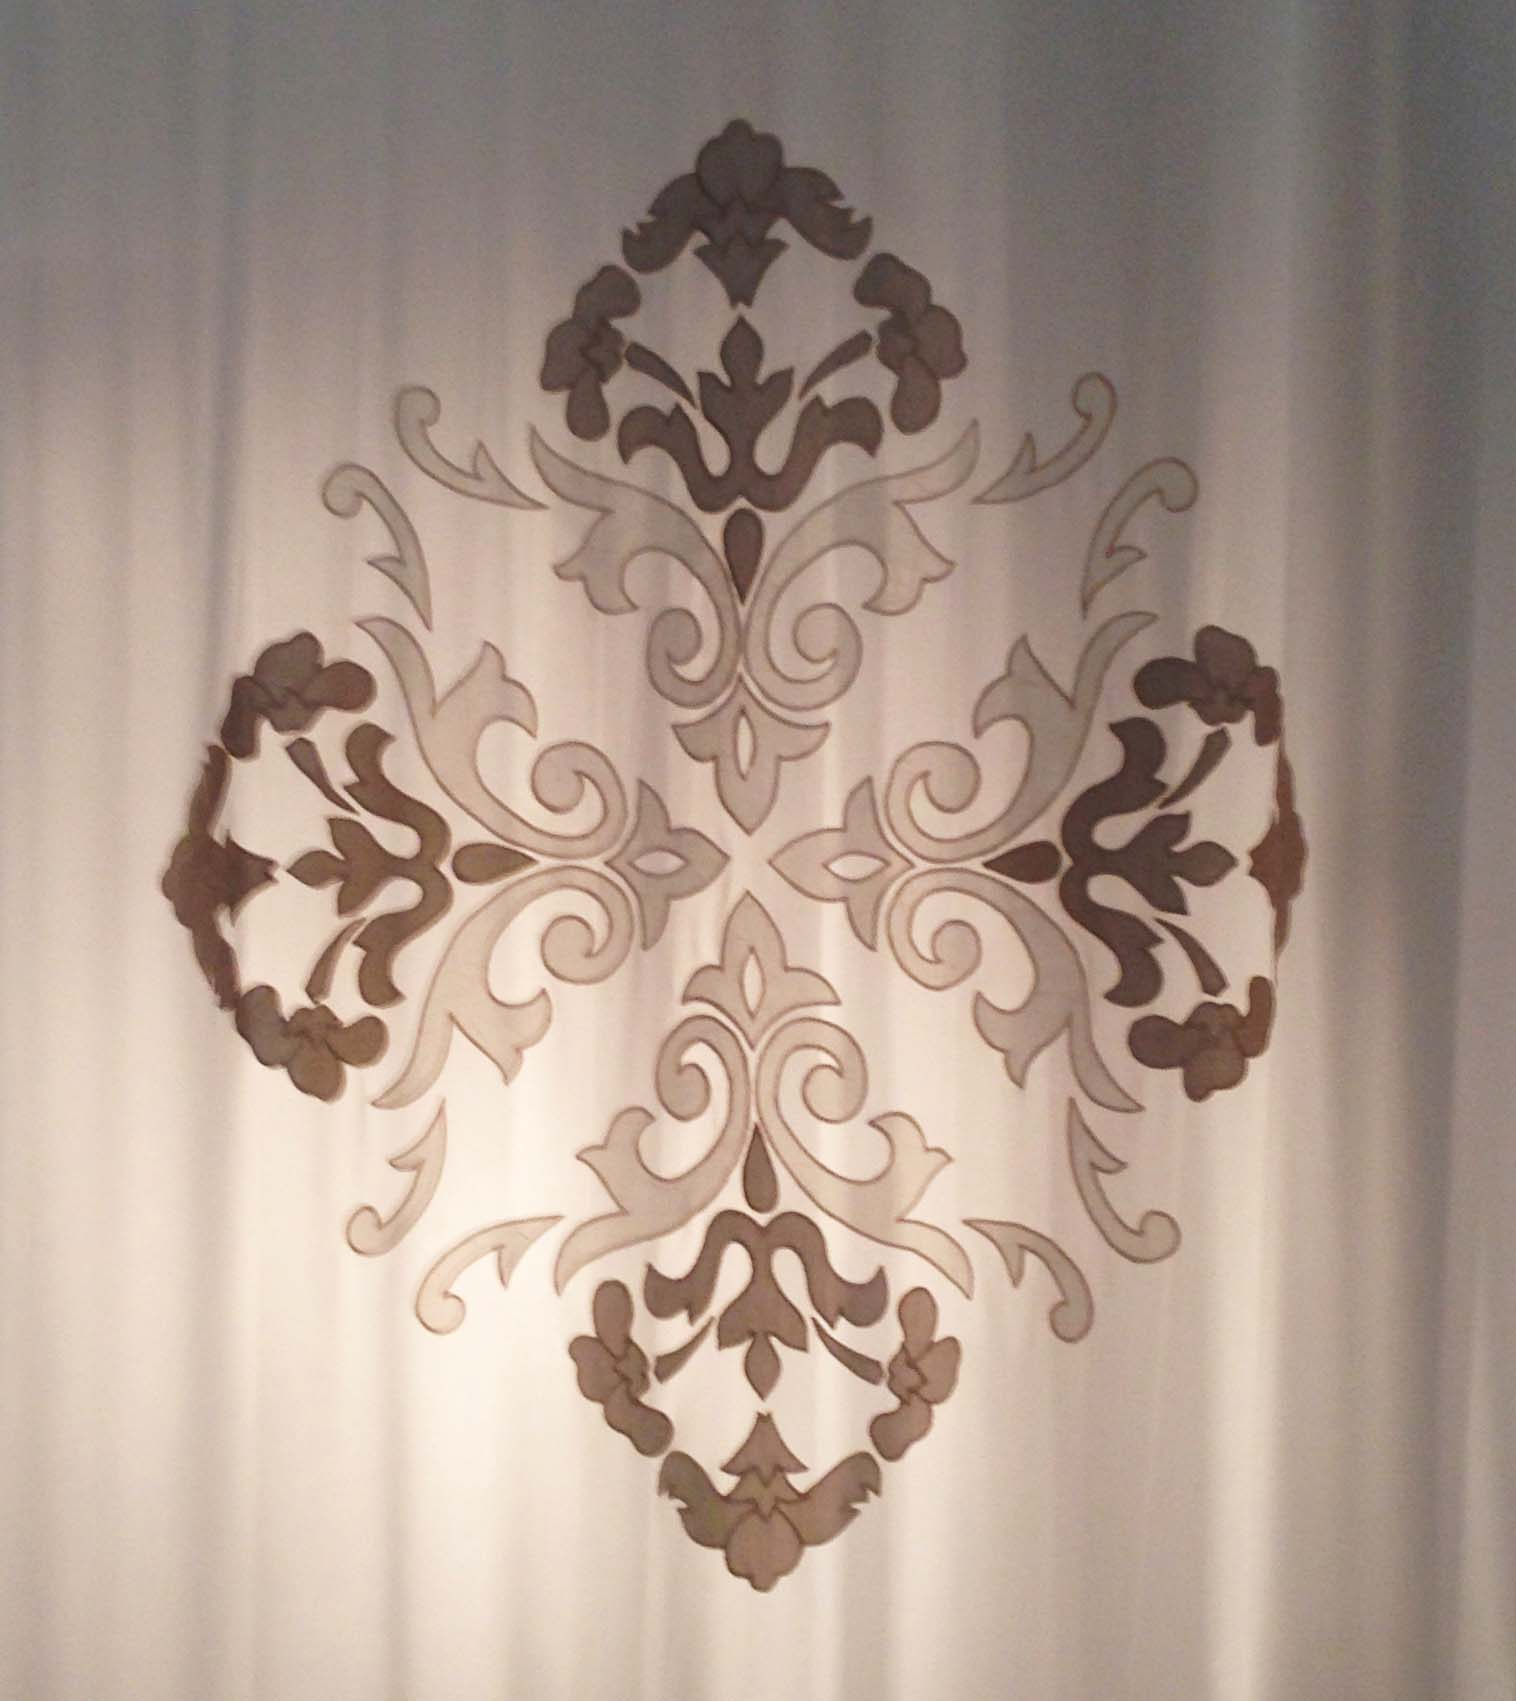 NUVOLA LILIUM prestigious embroidery